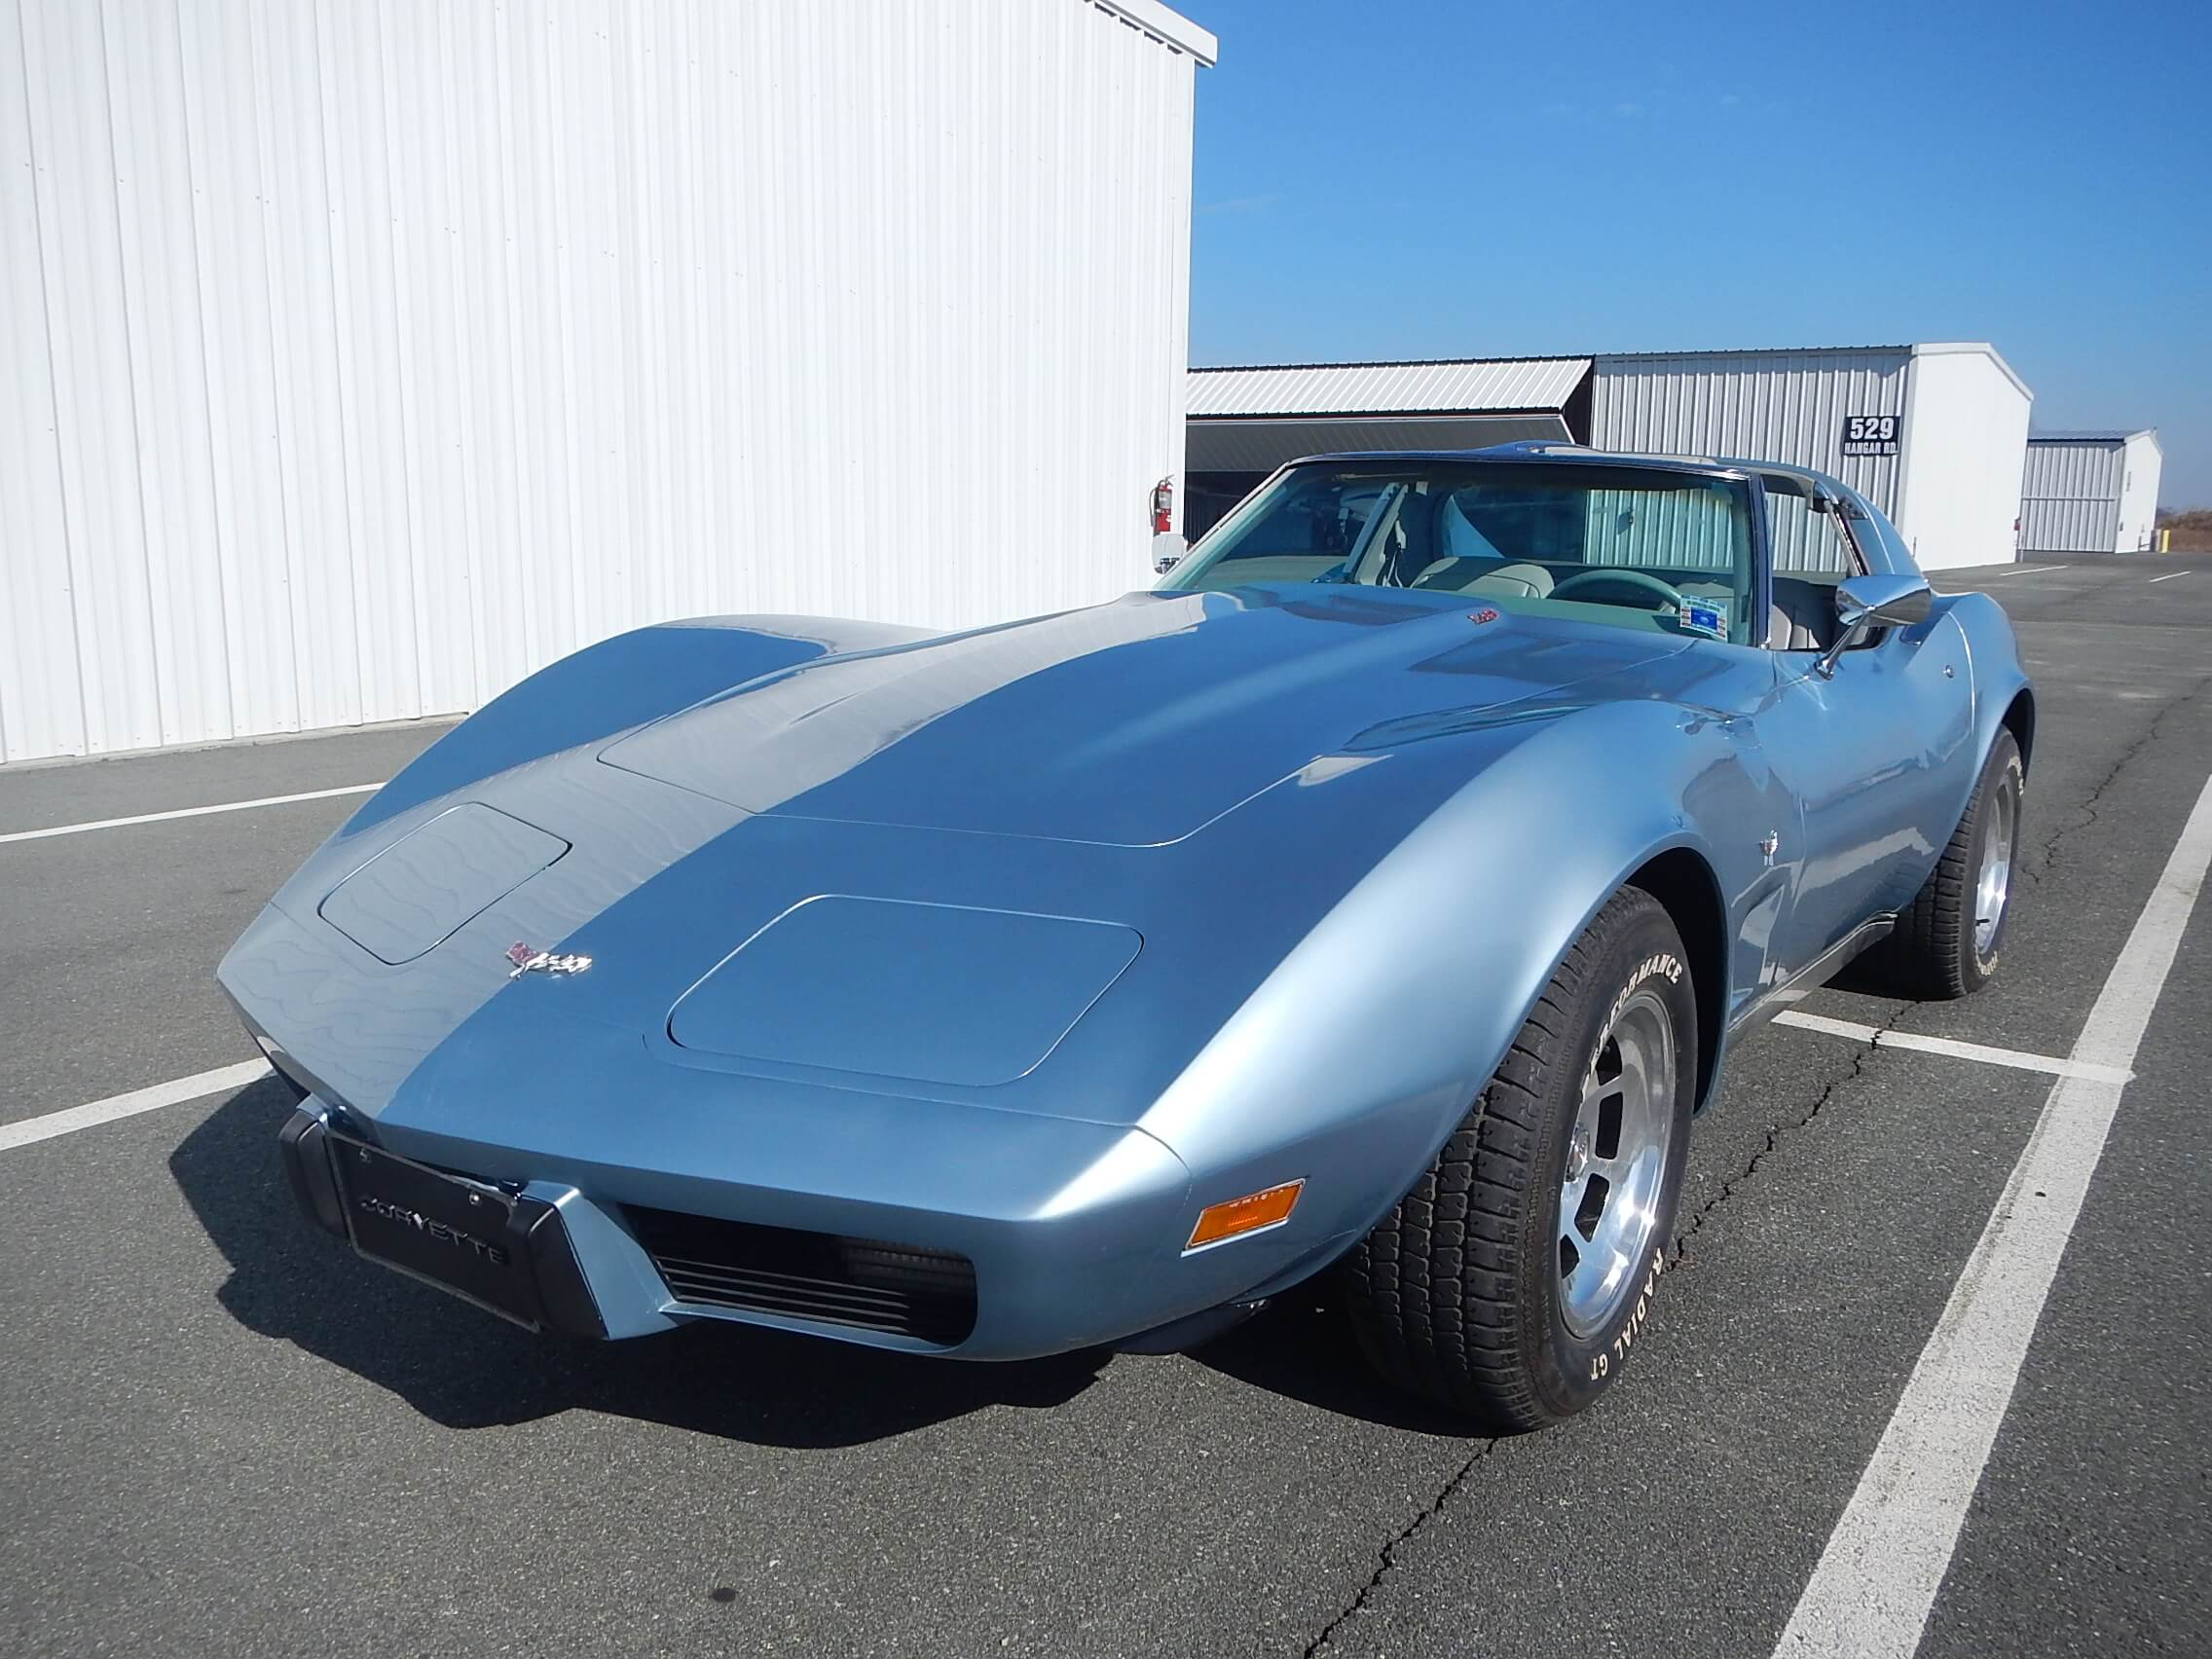 1977 Corvette Coupe restoration 37.JPG